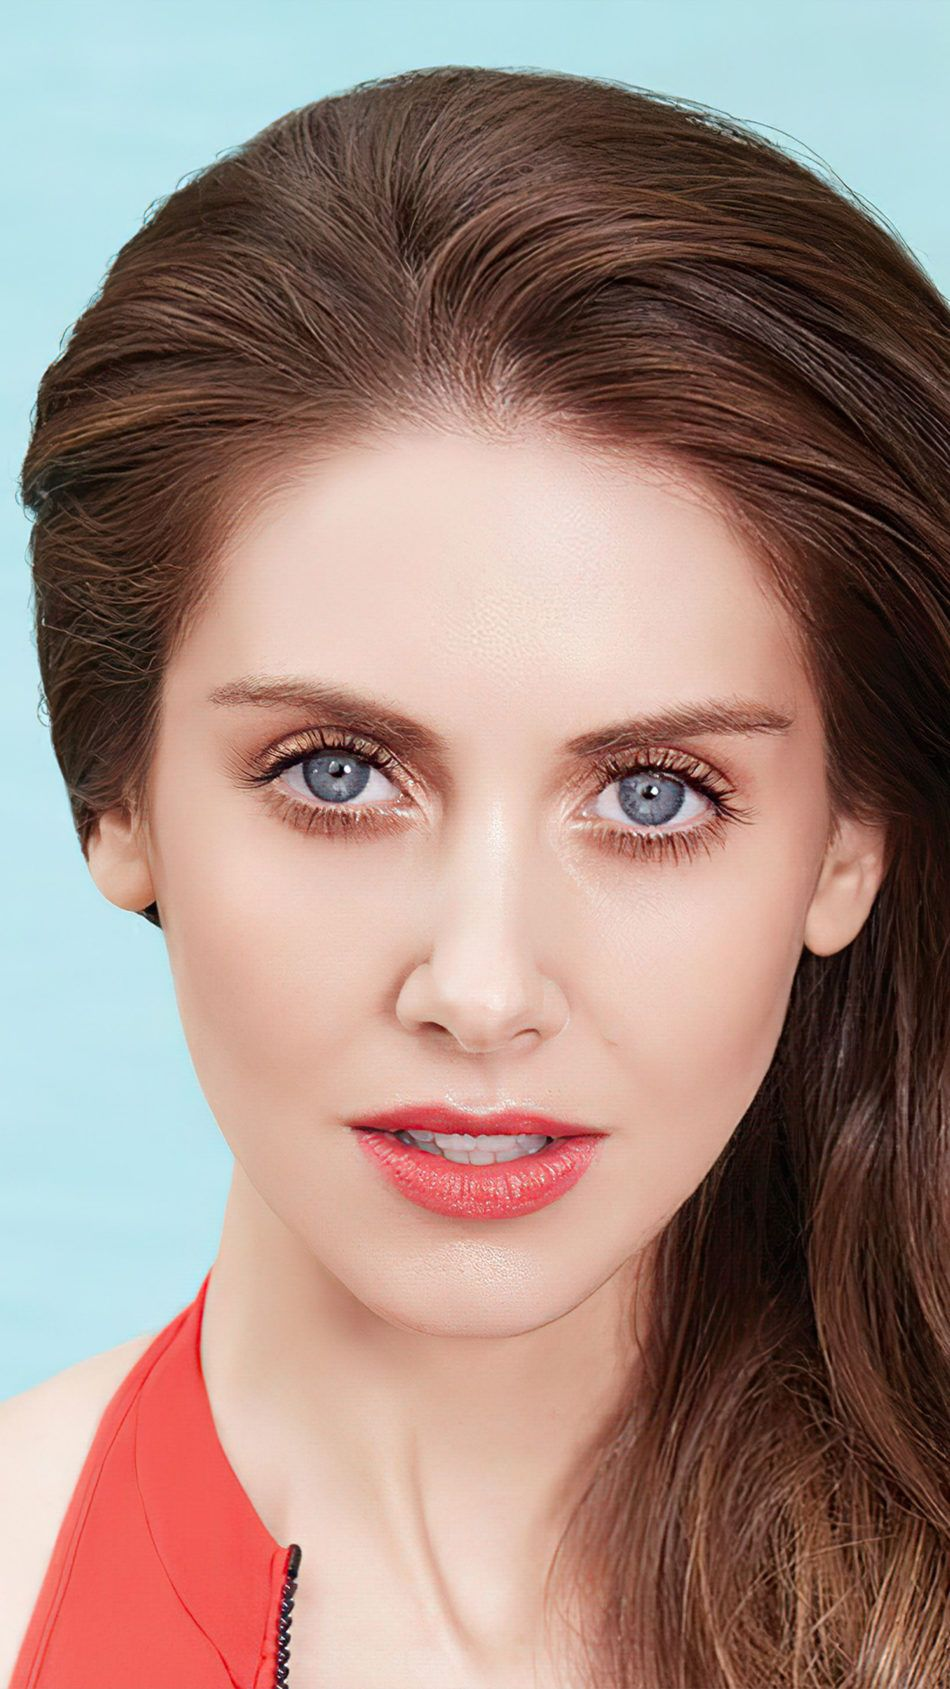 Alison Brie 2021 4k Ultra Hd Mobile Wallpaper In 2021 Celebrity Wallpapers Aqua Eyes Alison Brie